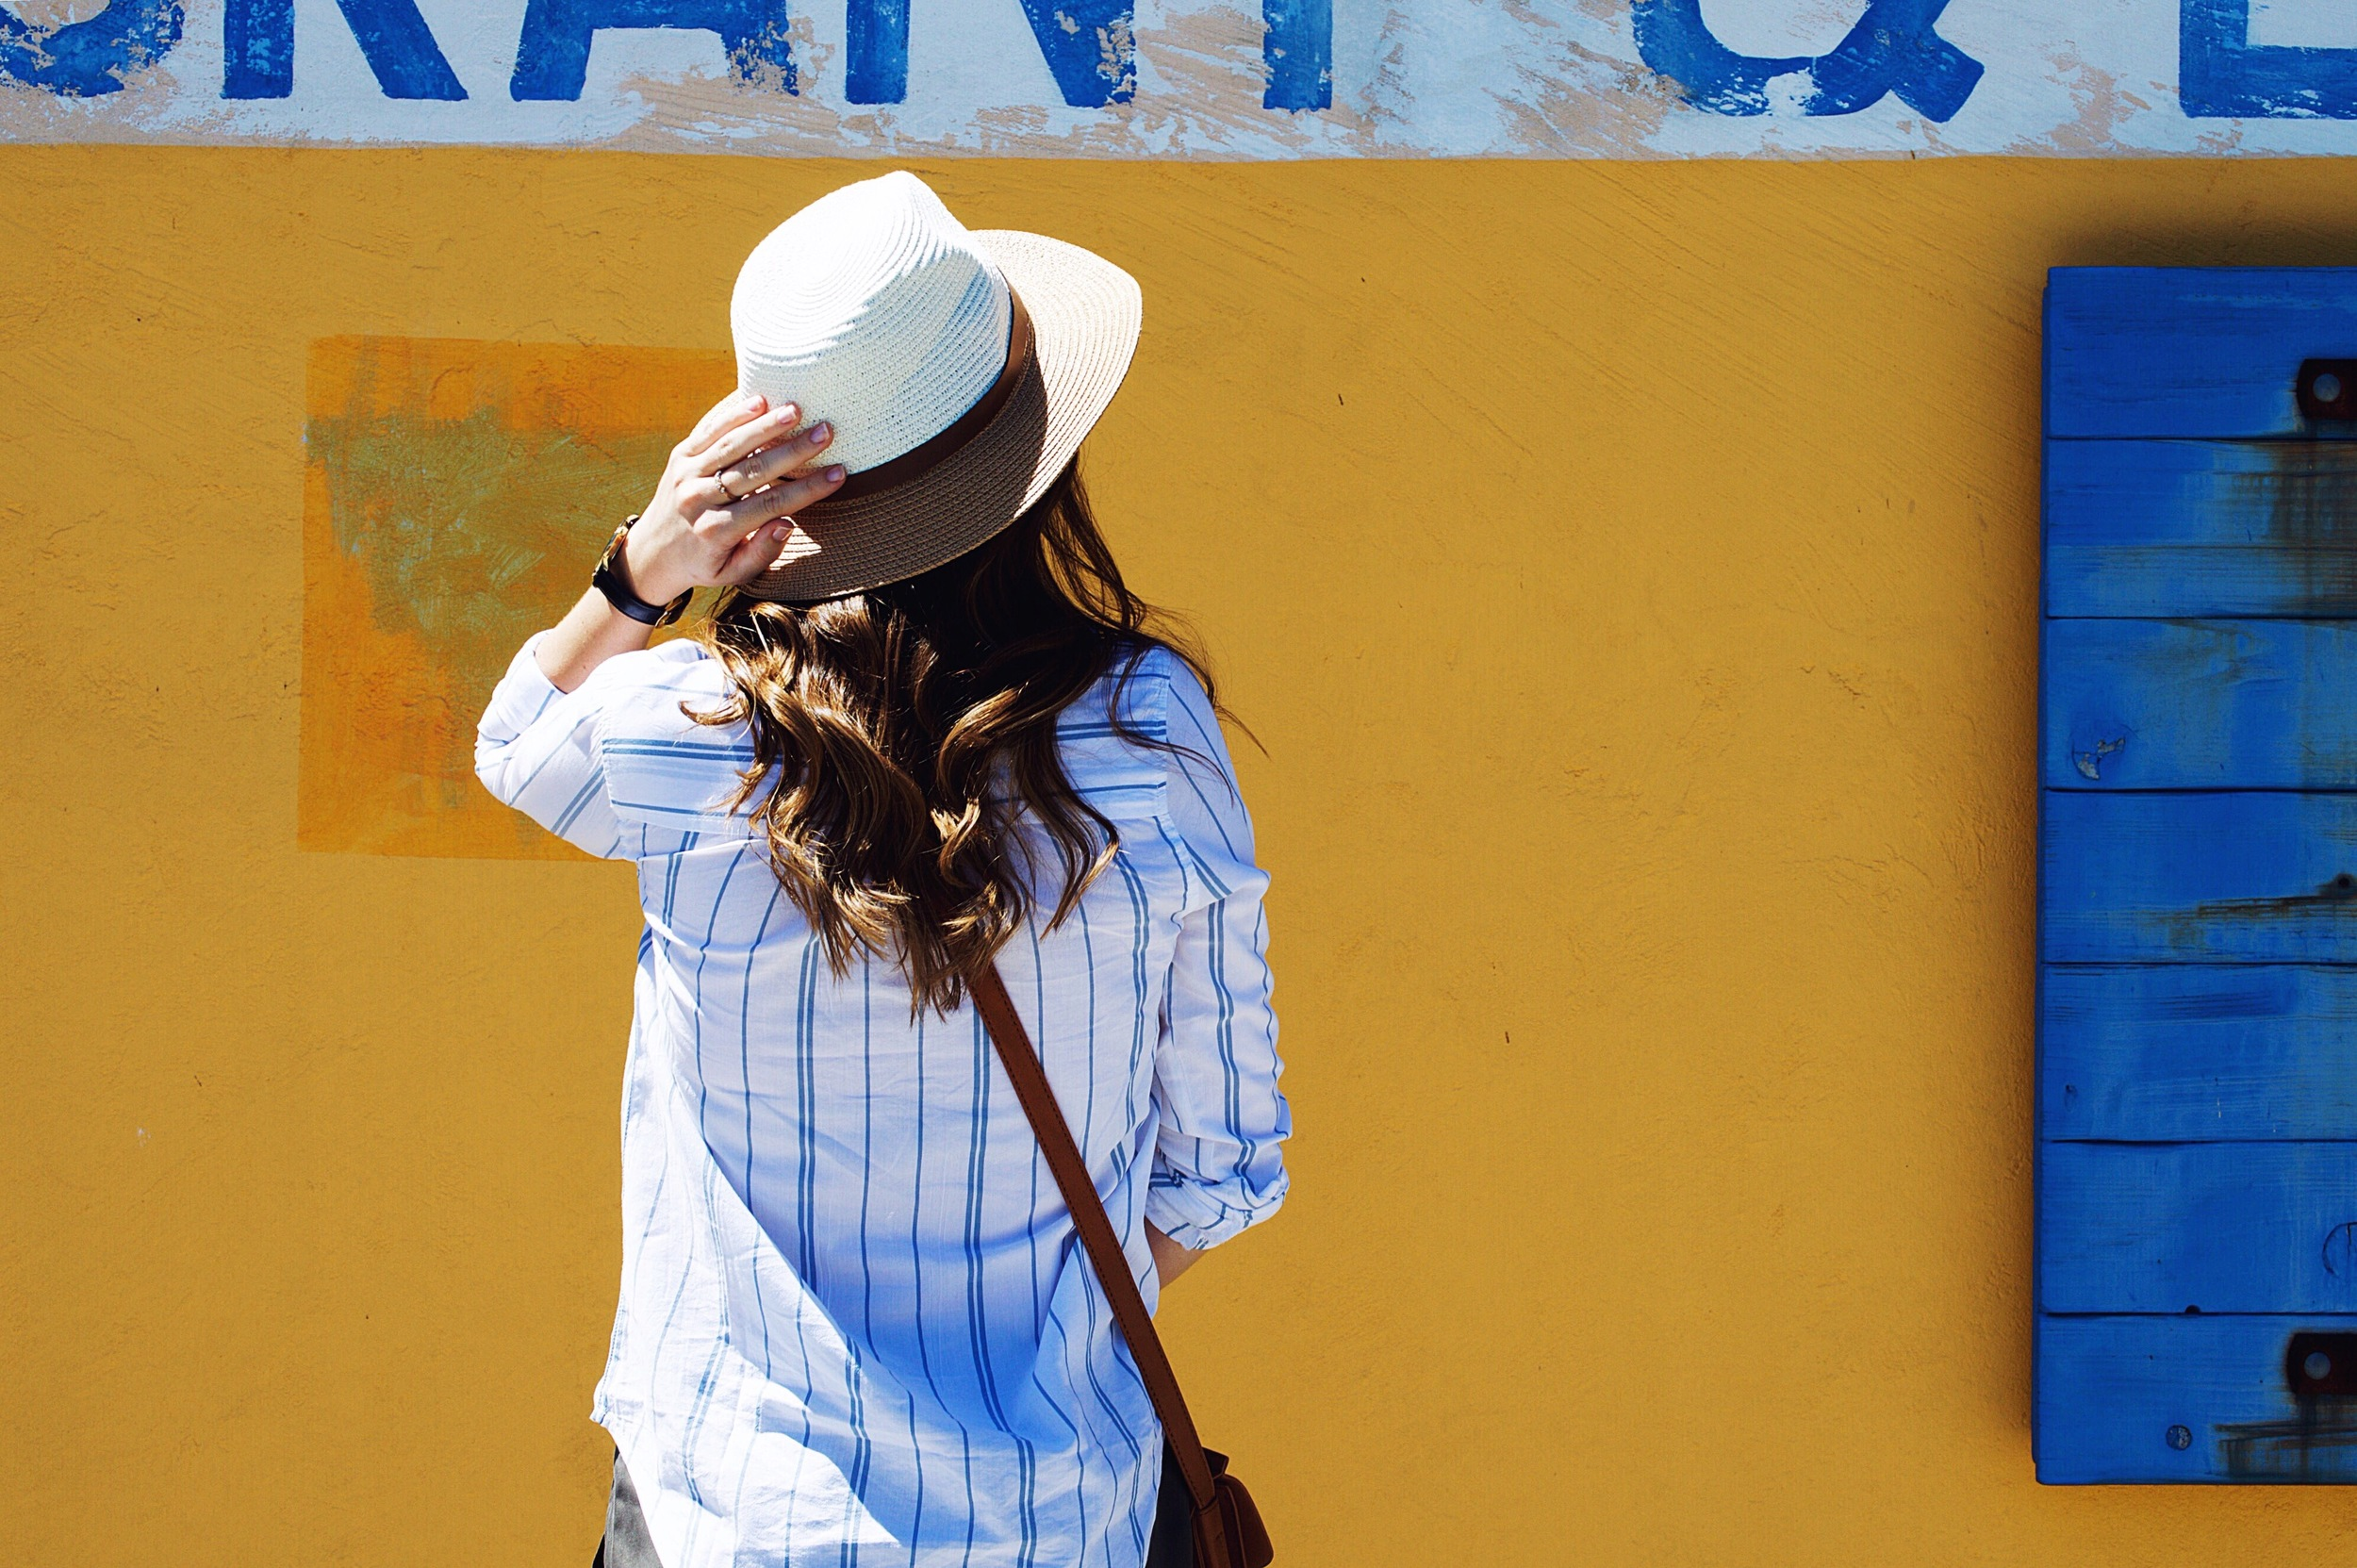 Shop the Look Below. Hat: c/o  SheIn . Top:  Nordstrom . Shorts:  Nordstrom . Bag: c/o  SheIn .